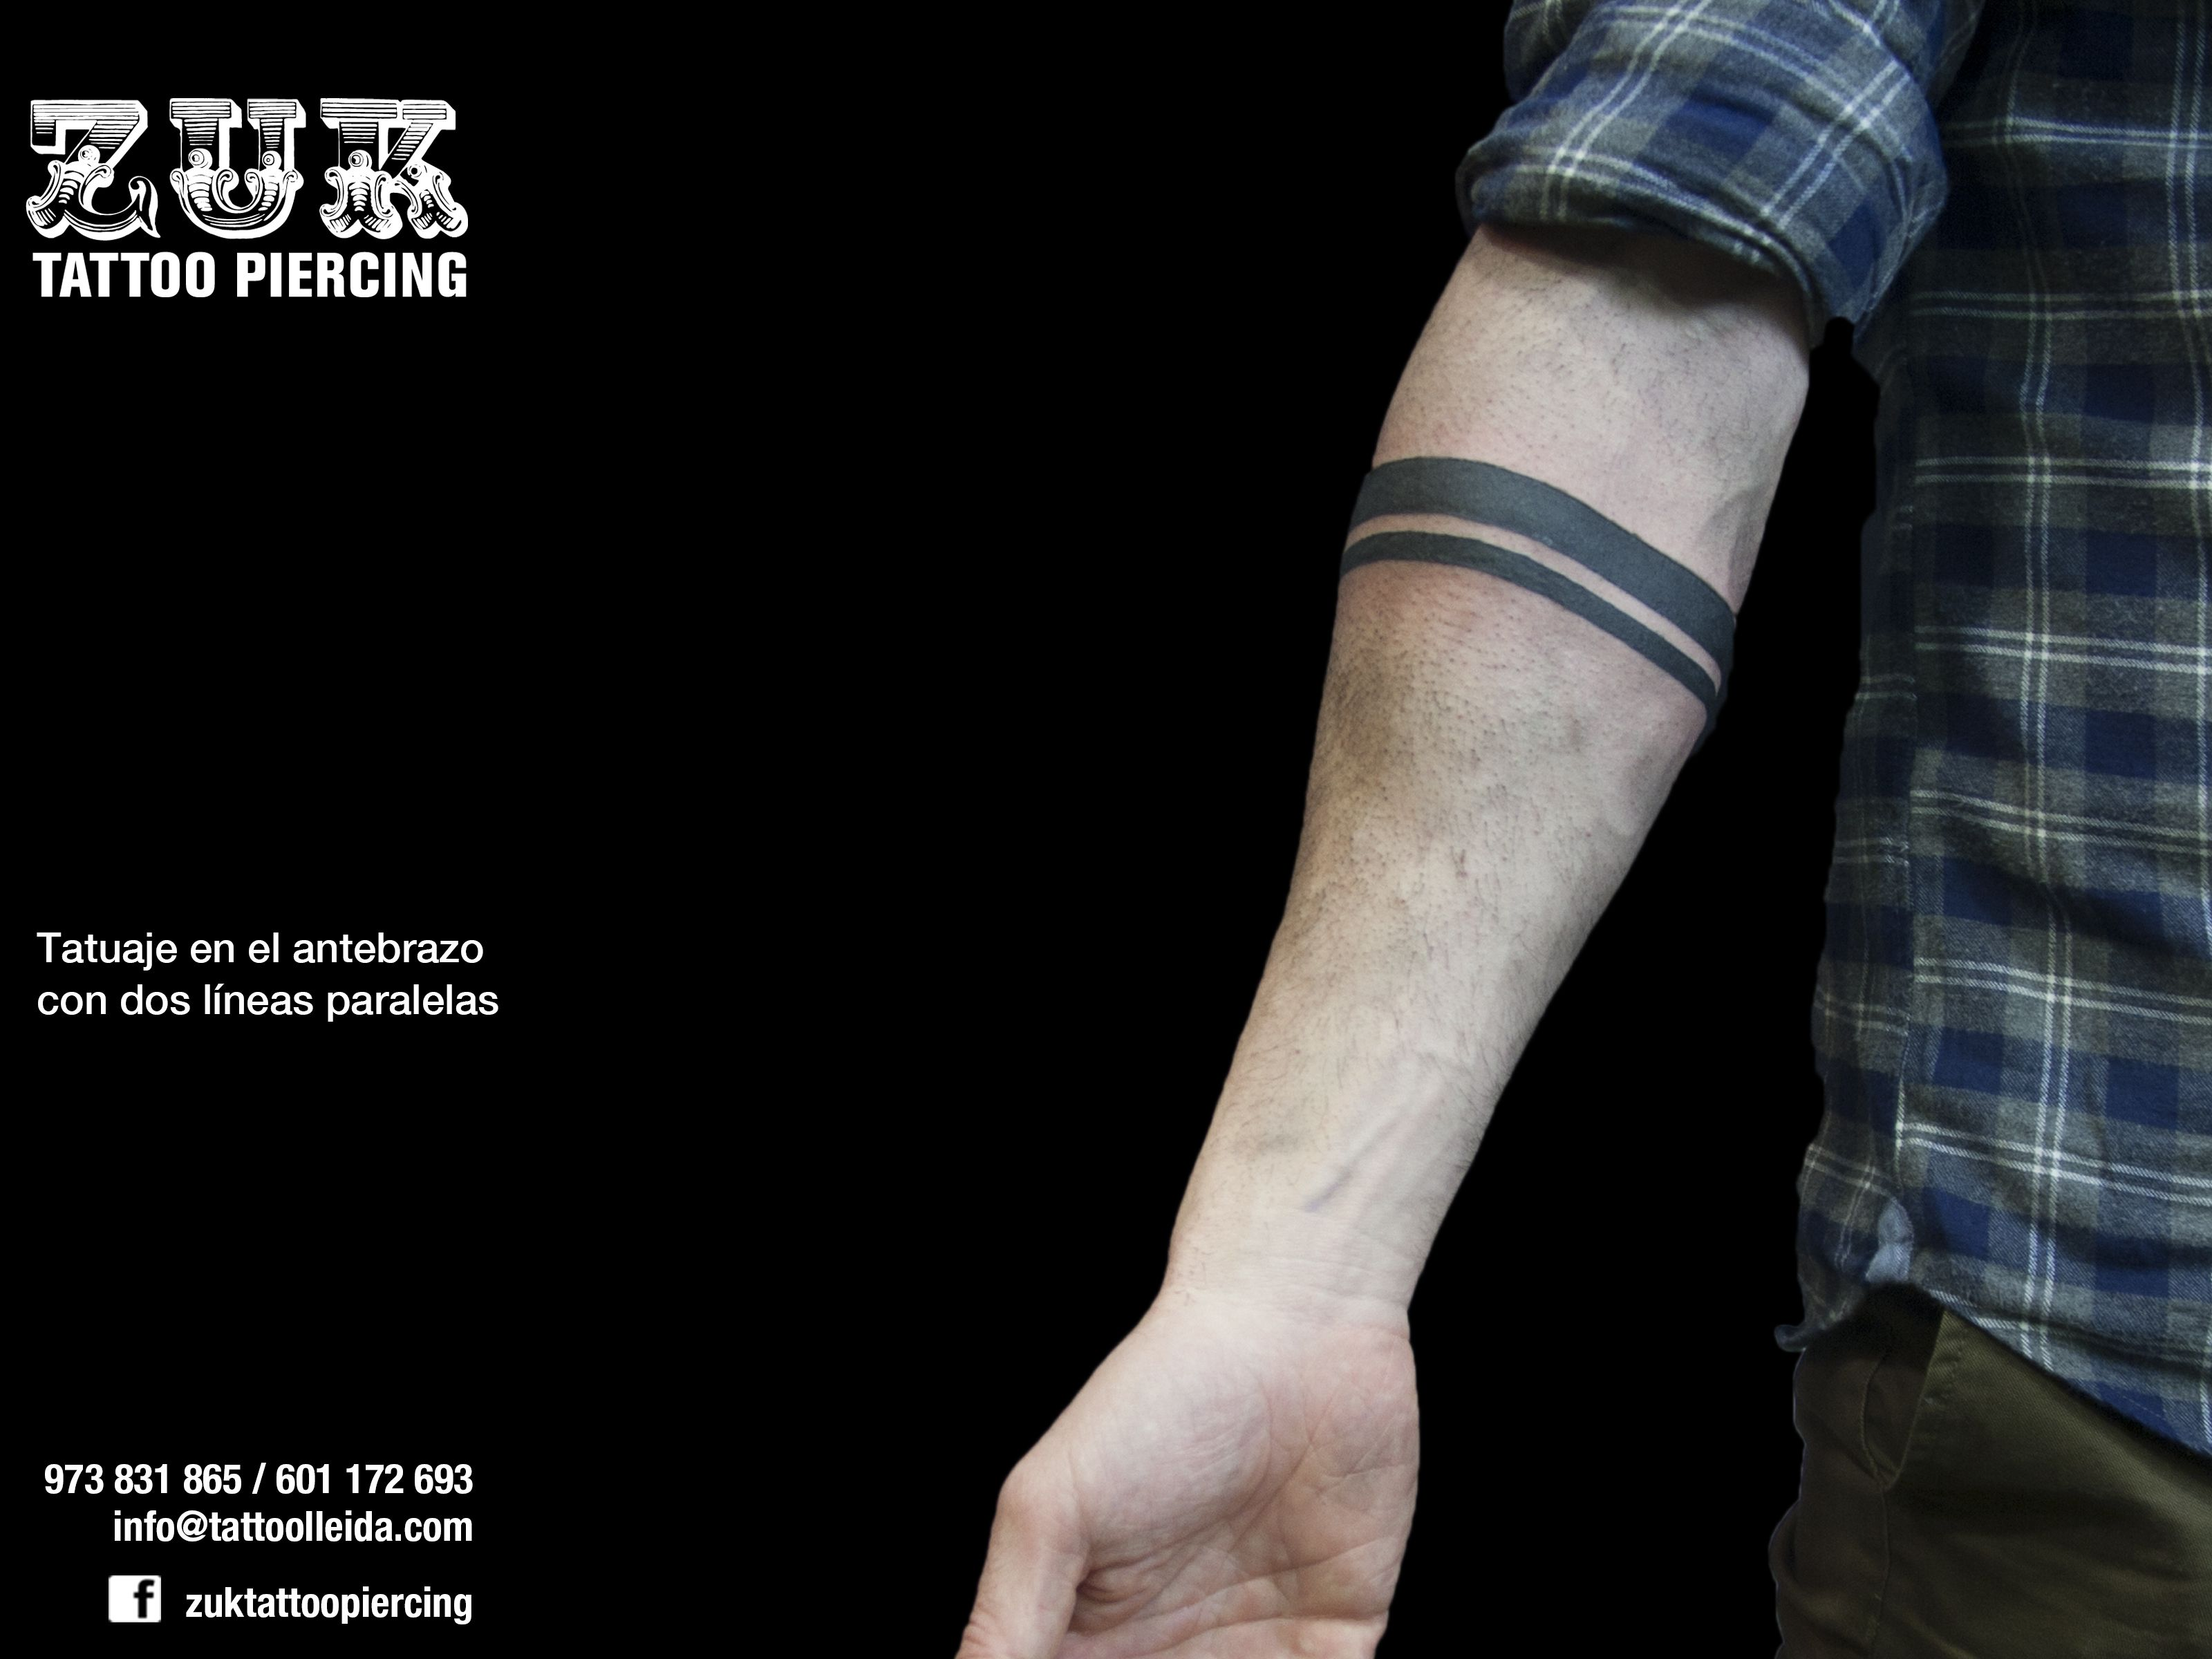 Tatuaje En El Antebrazo Con Dos Líneas Paralelas Tatuajes